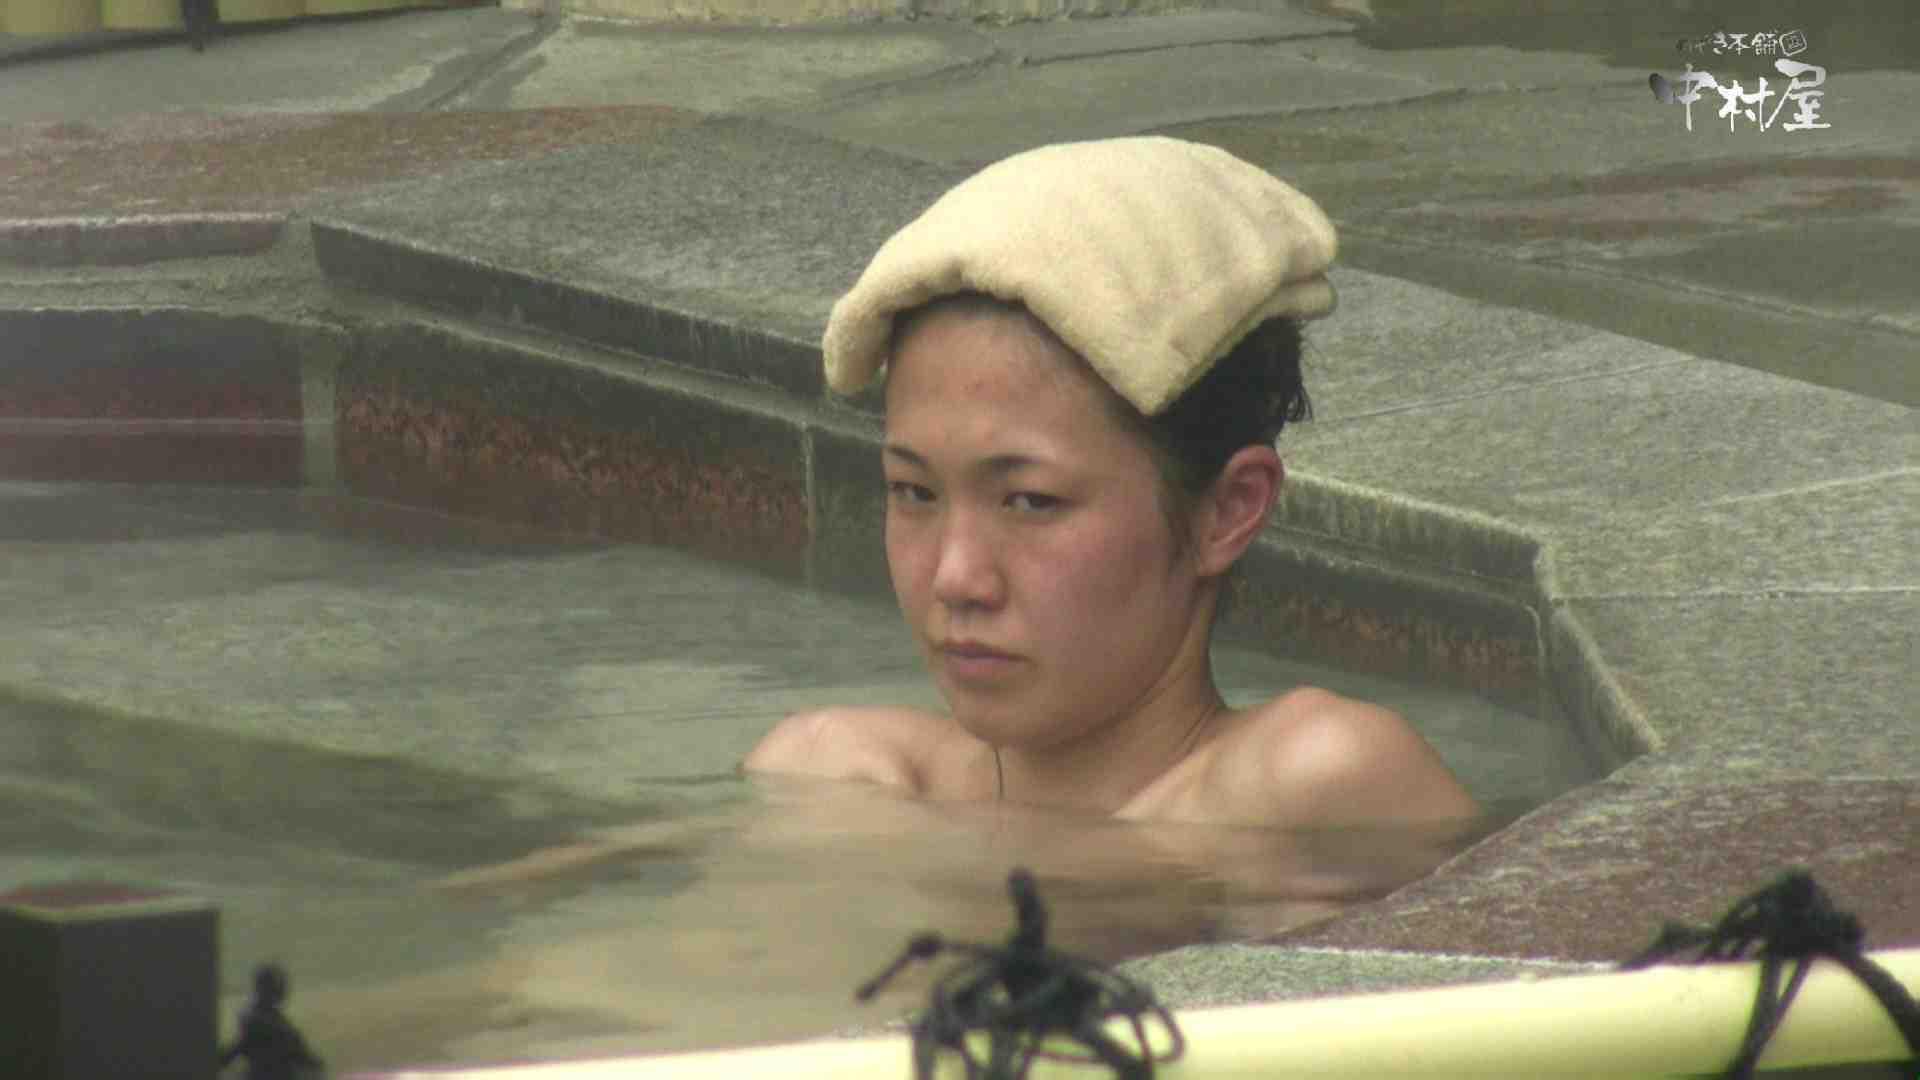 Aquaな露天風呂Vol.889 0   0  87連発 17